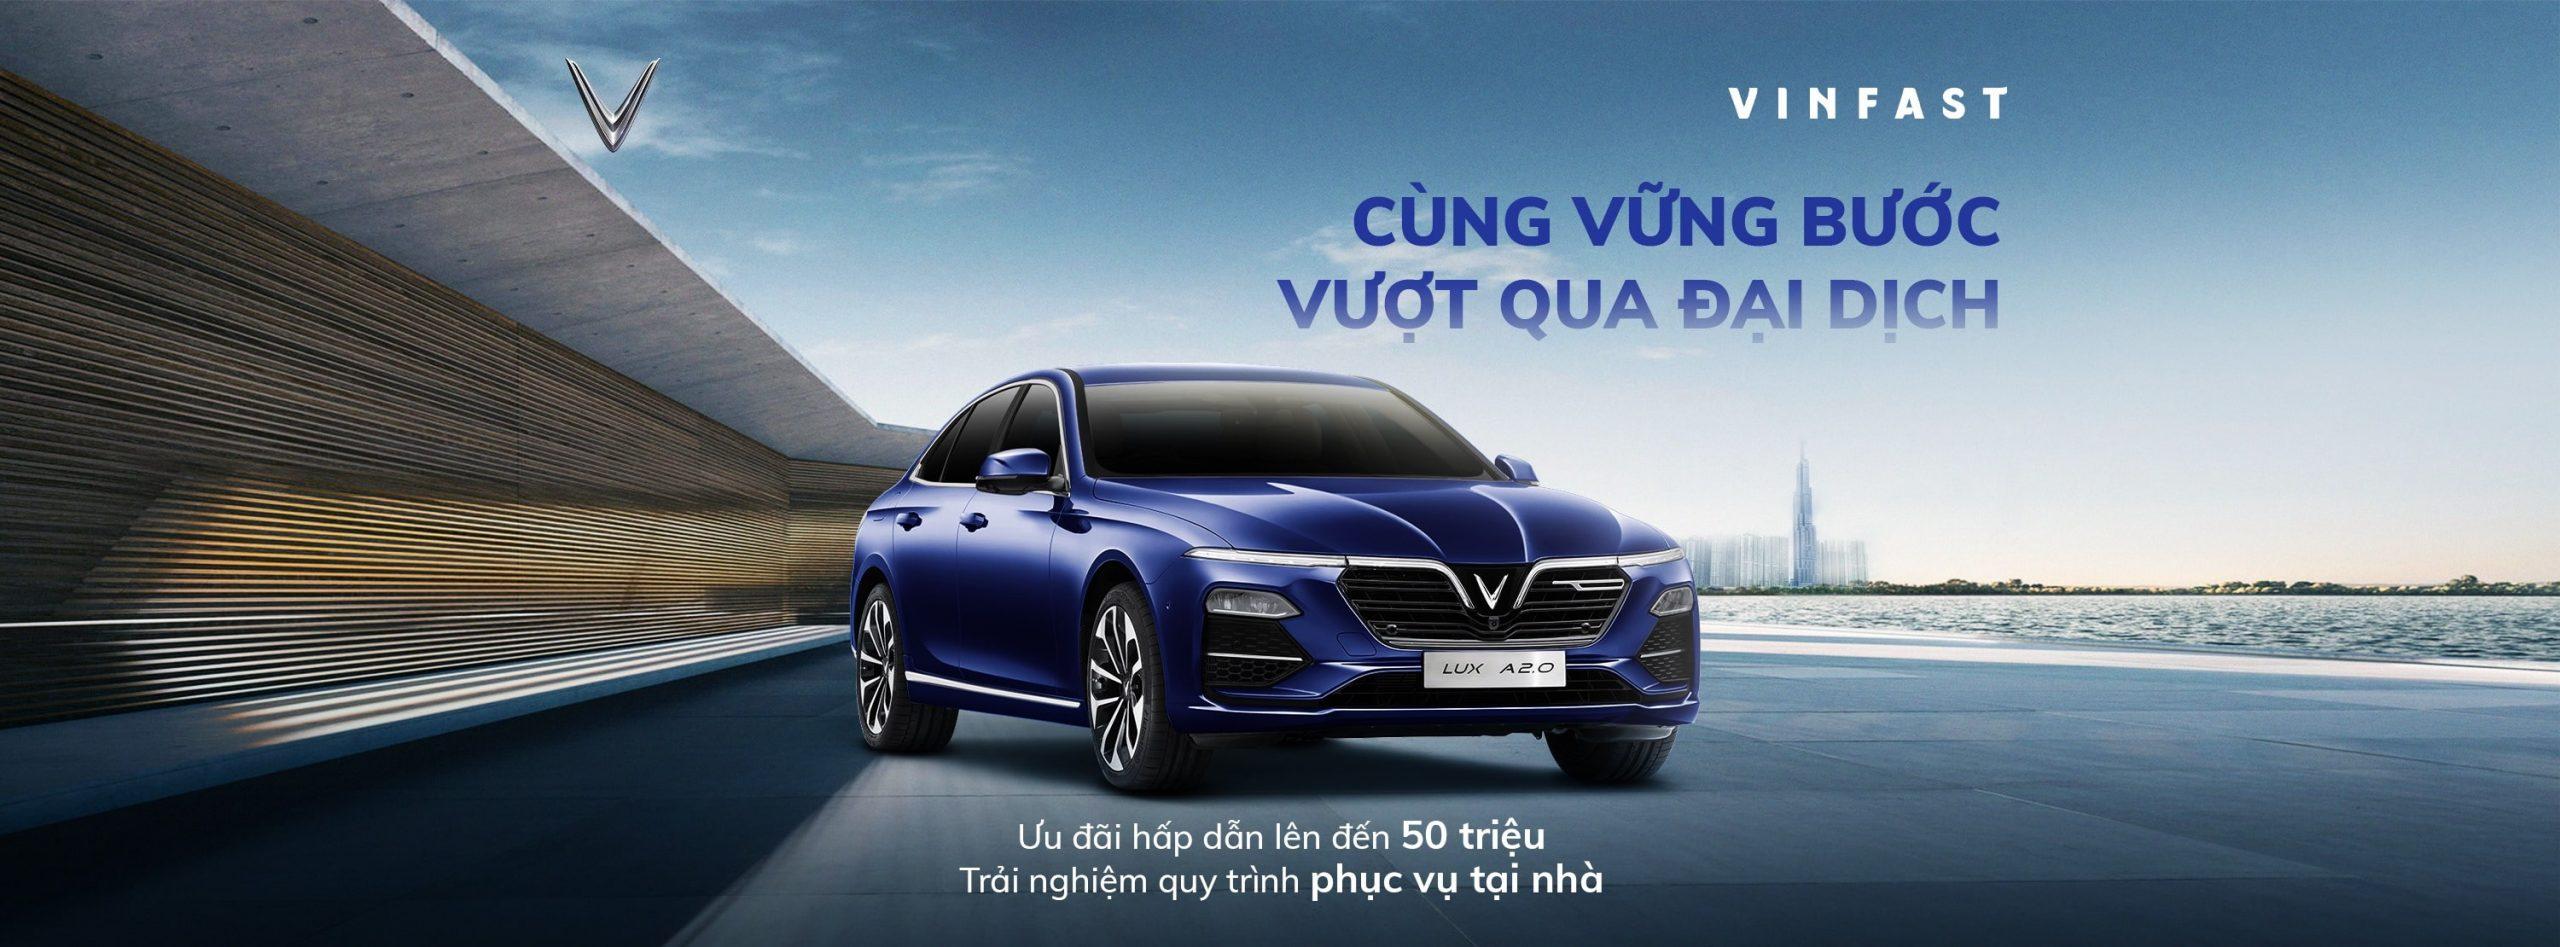 Giá xe VinFast Lux A